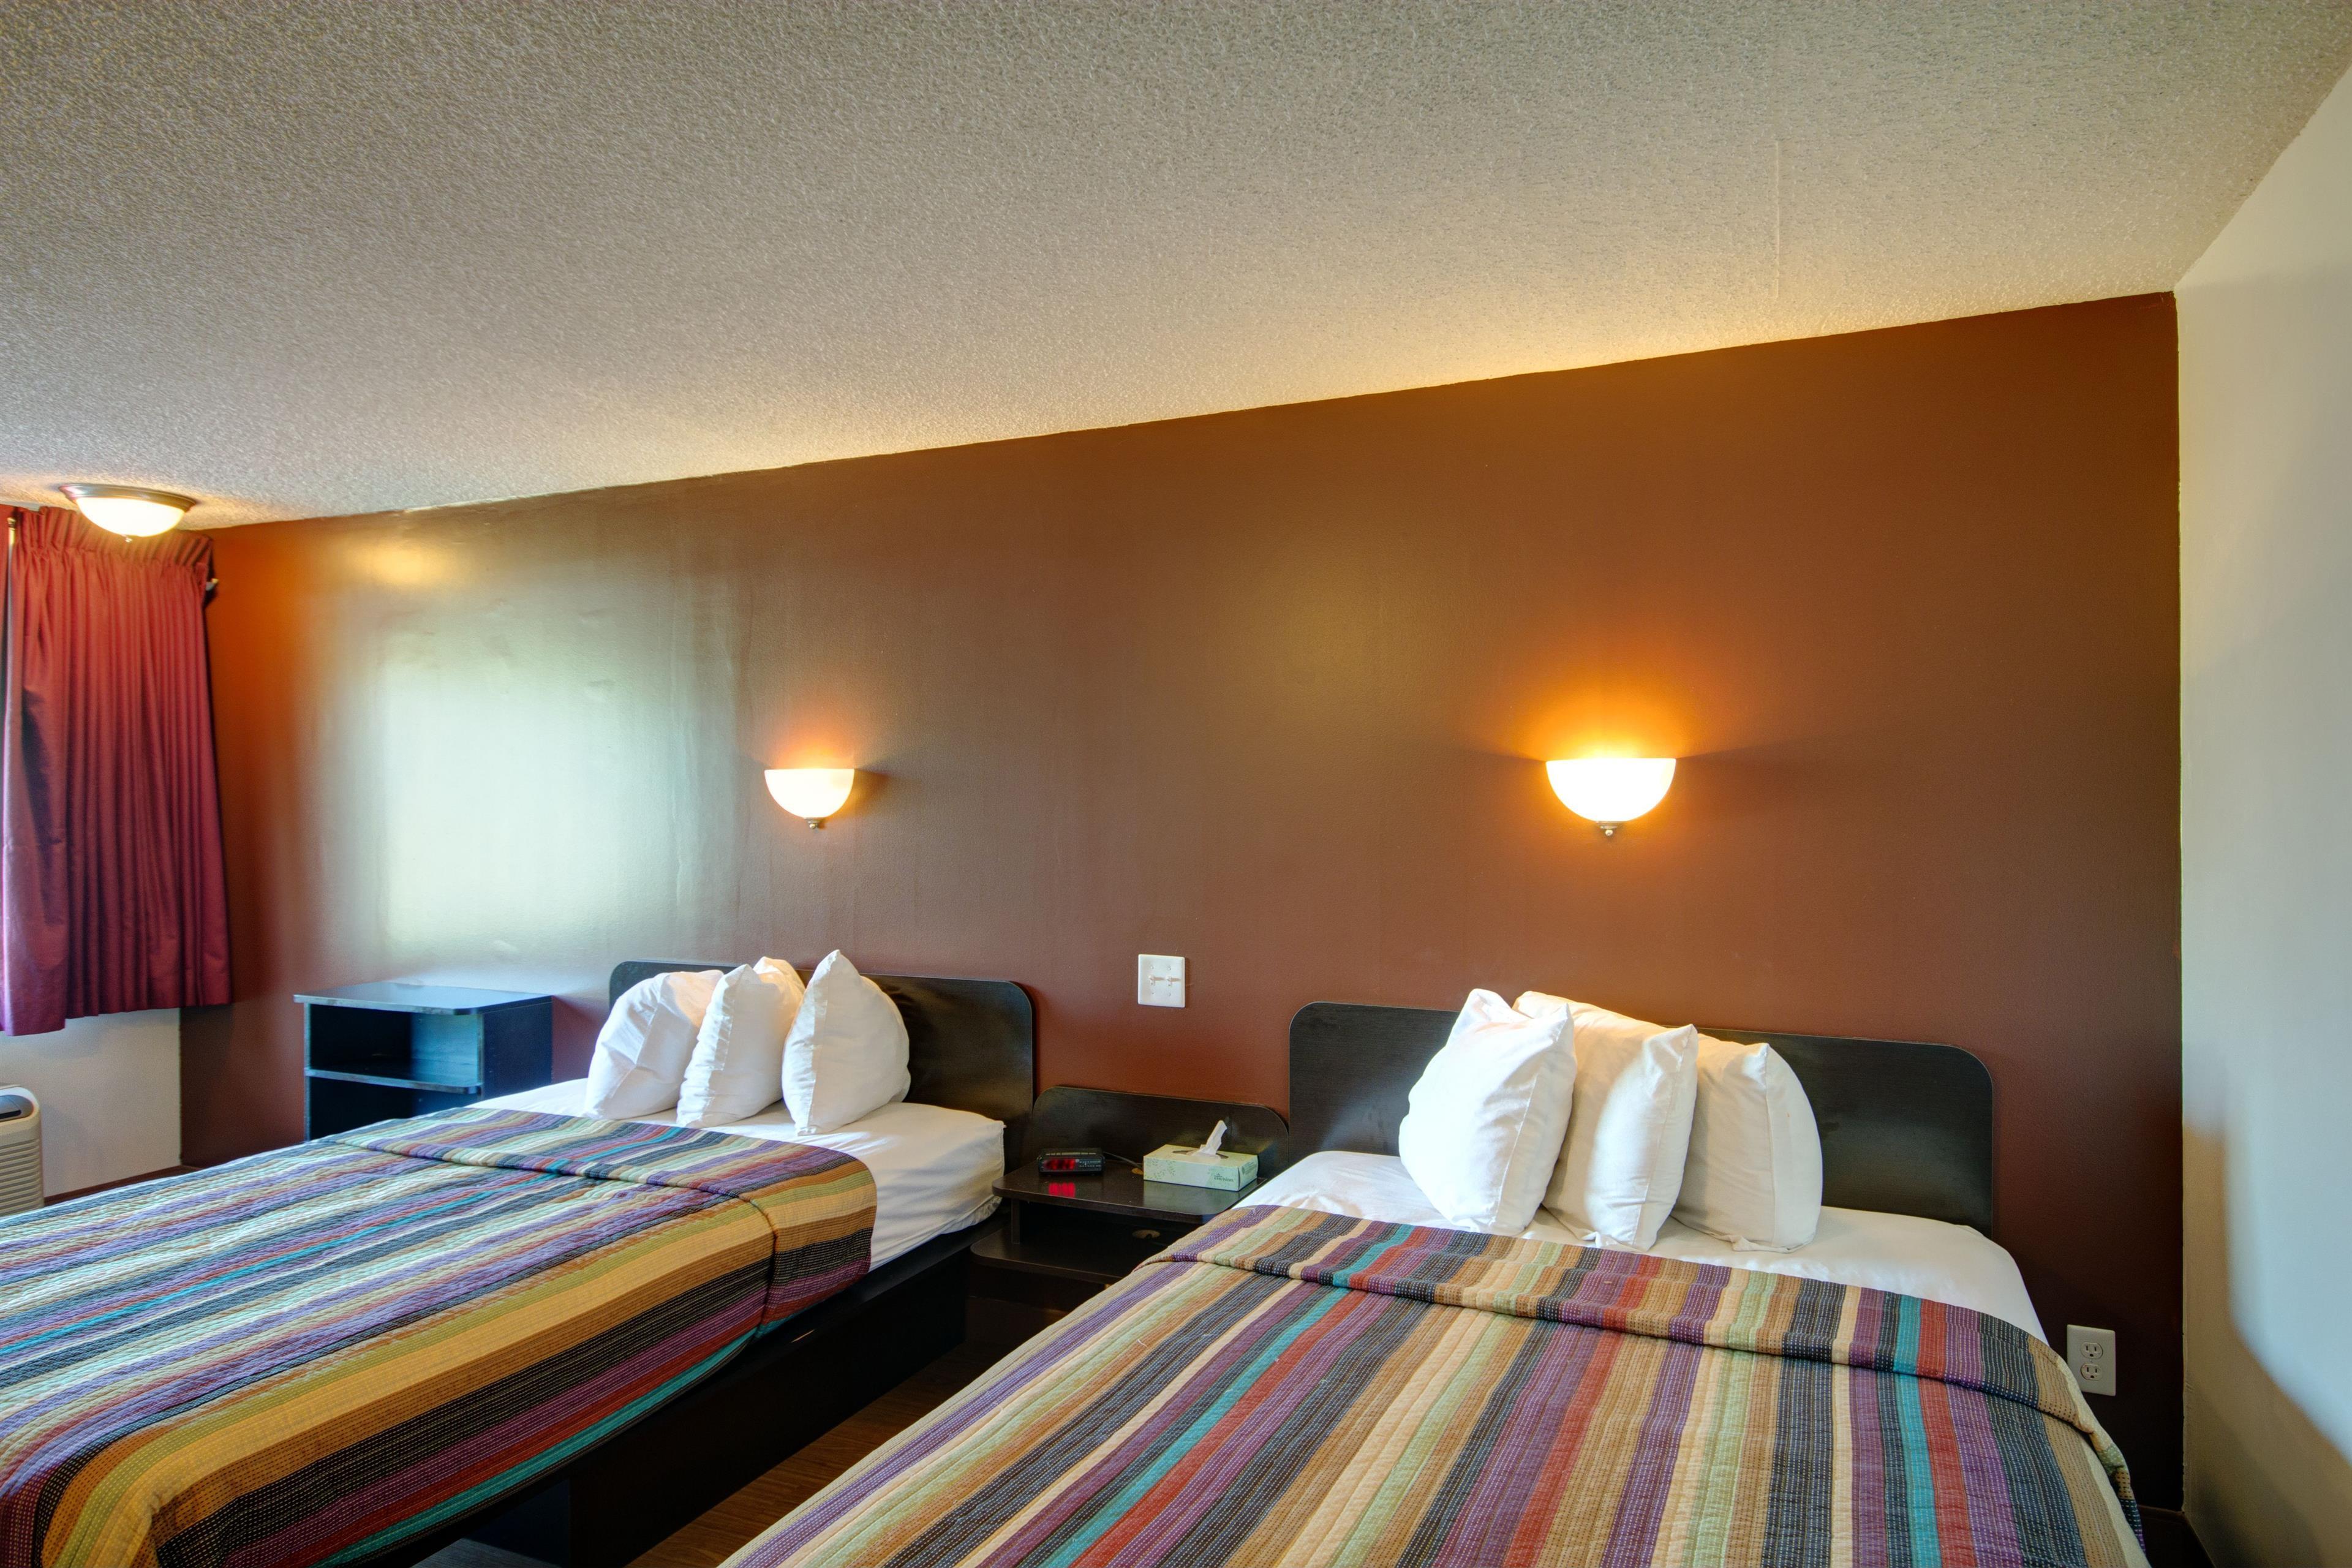 Americas Best Value Inn - Heath/Newark image 15